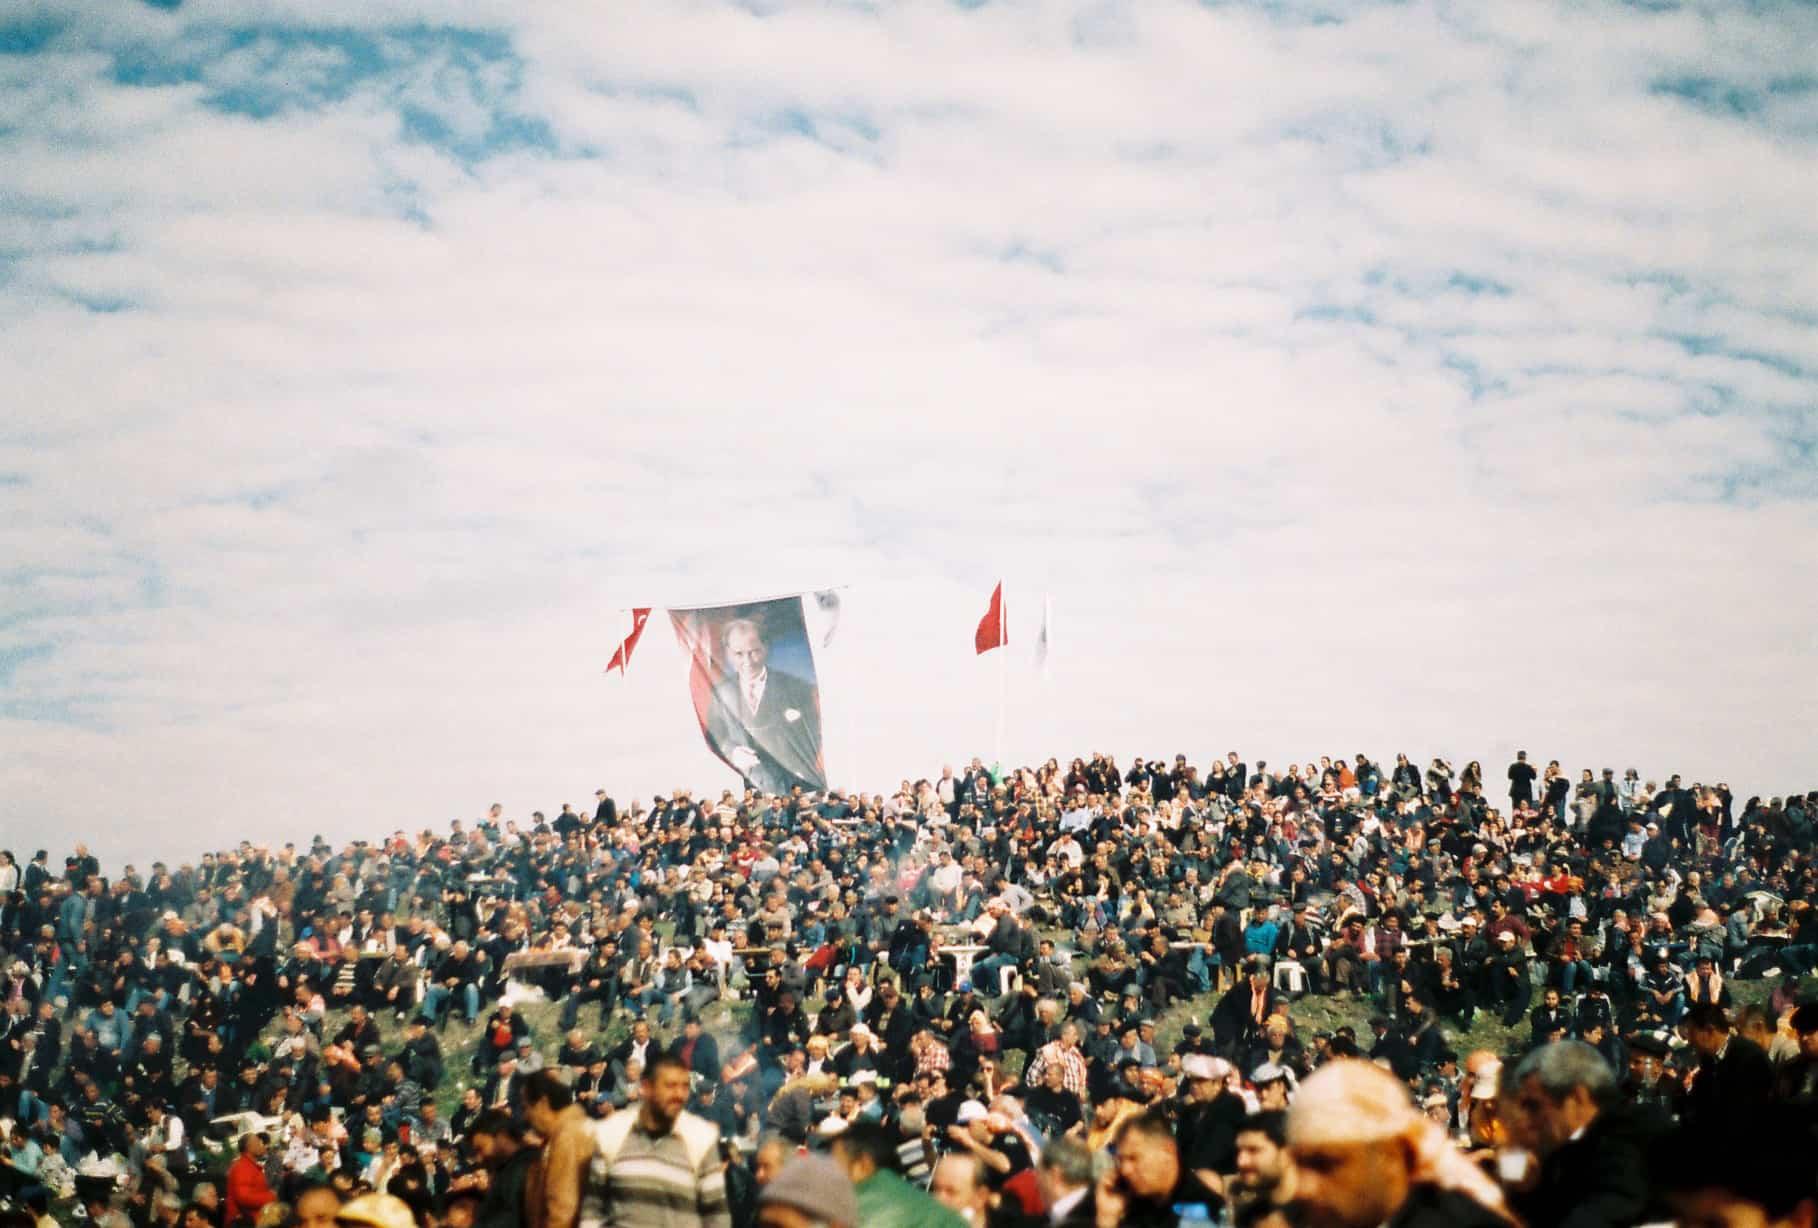 Ataturk and Camel Crowd (camel wrestling festival)